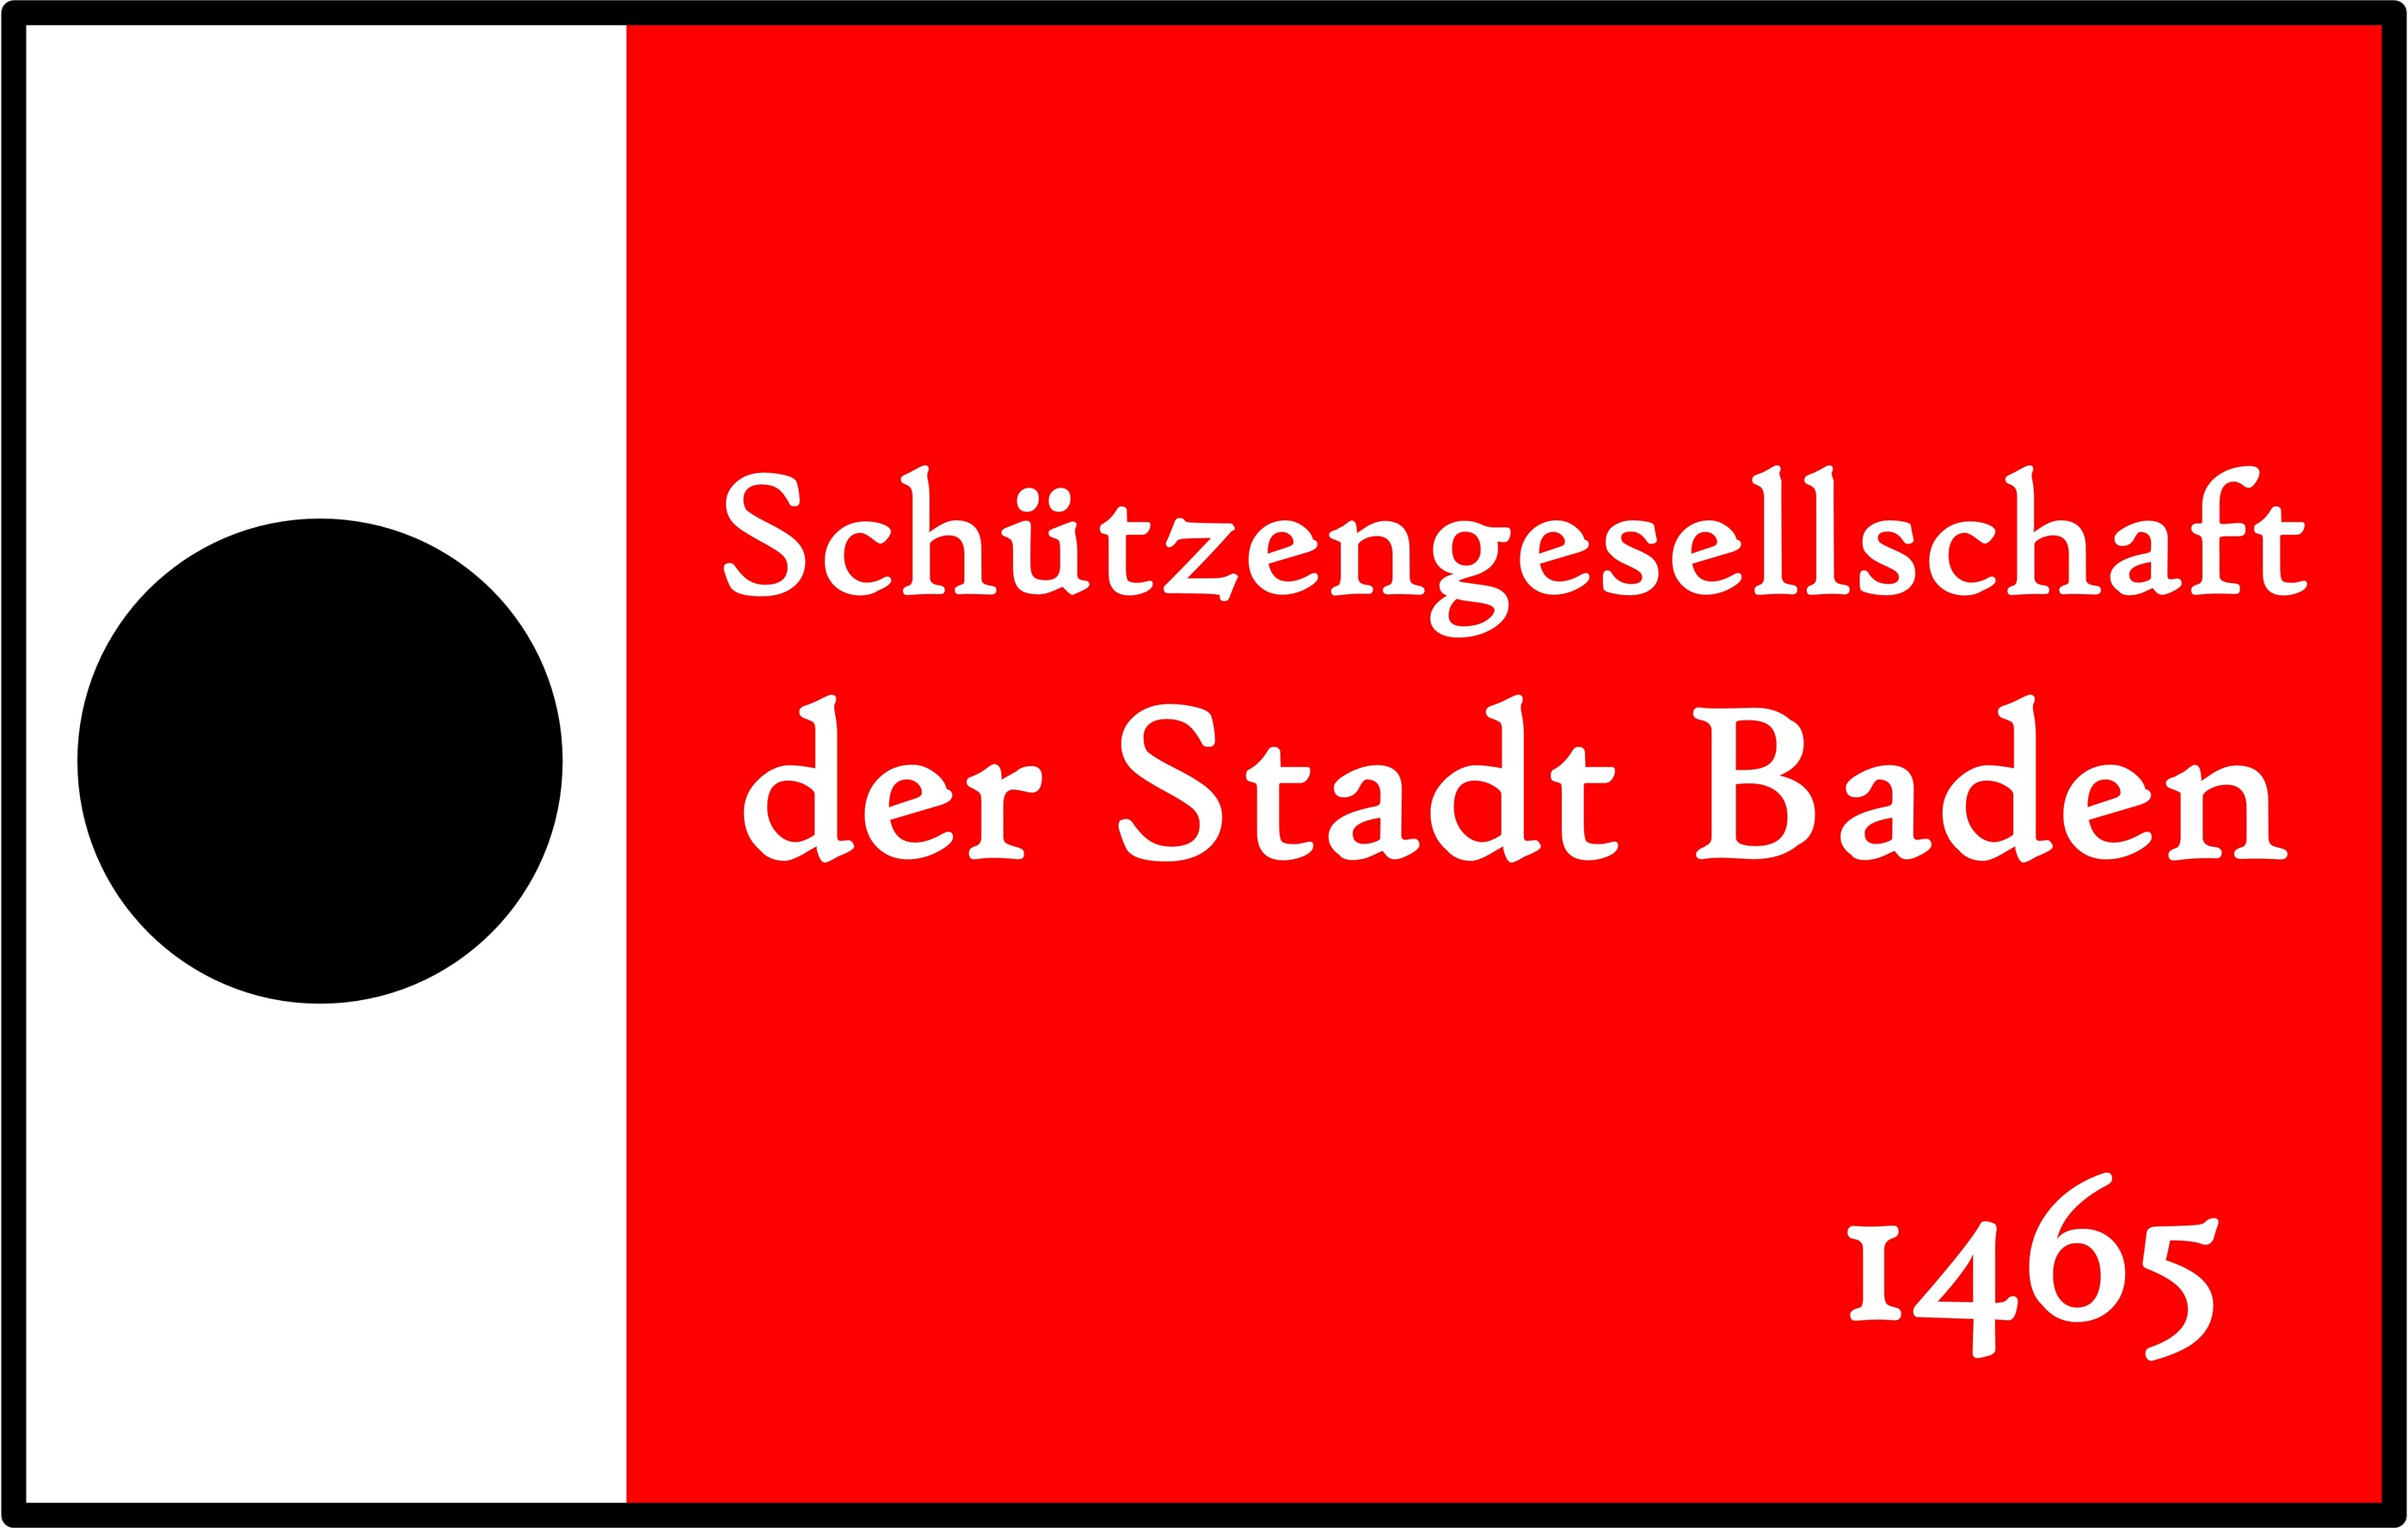 Schützengesellschaft der Stadt Baden